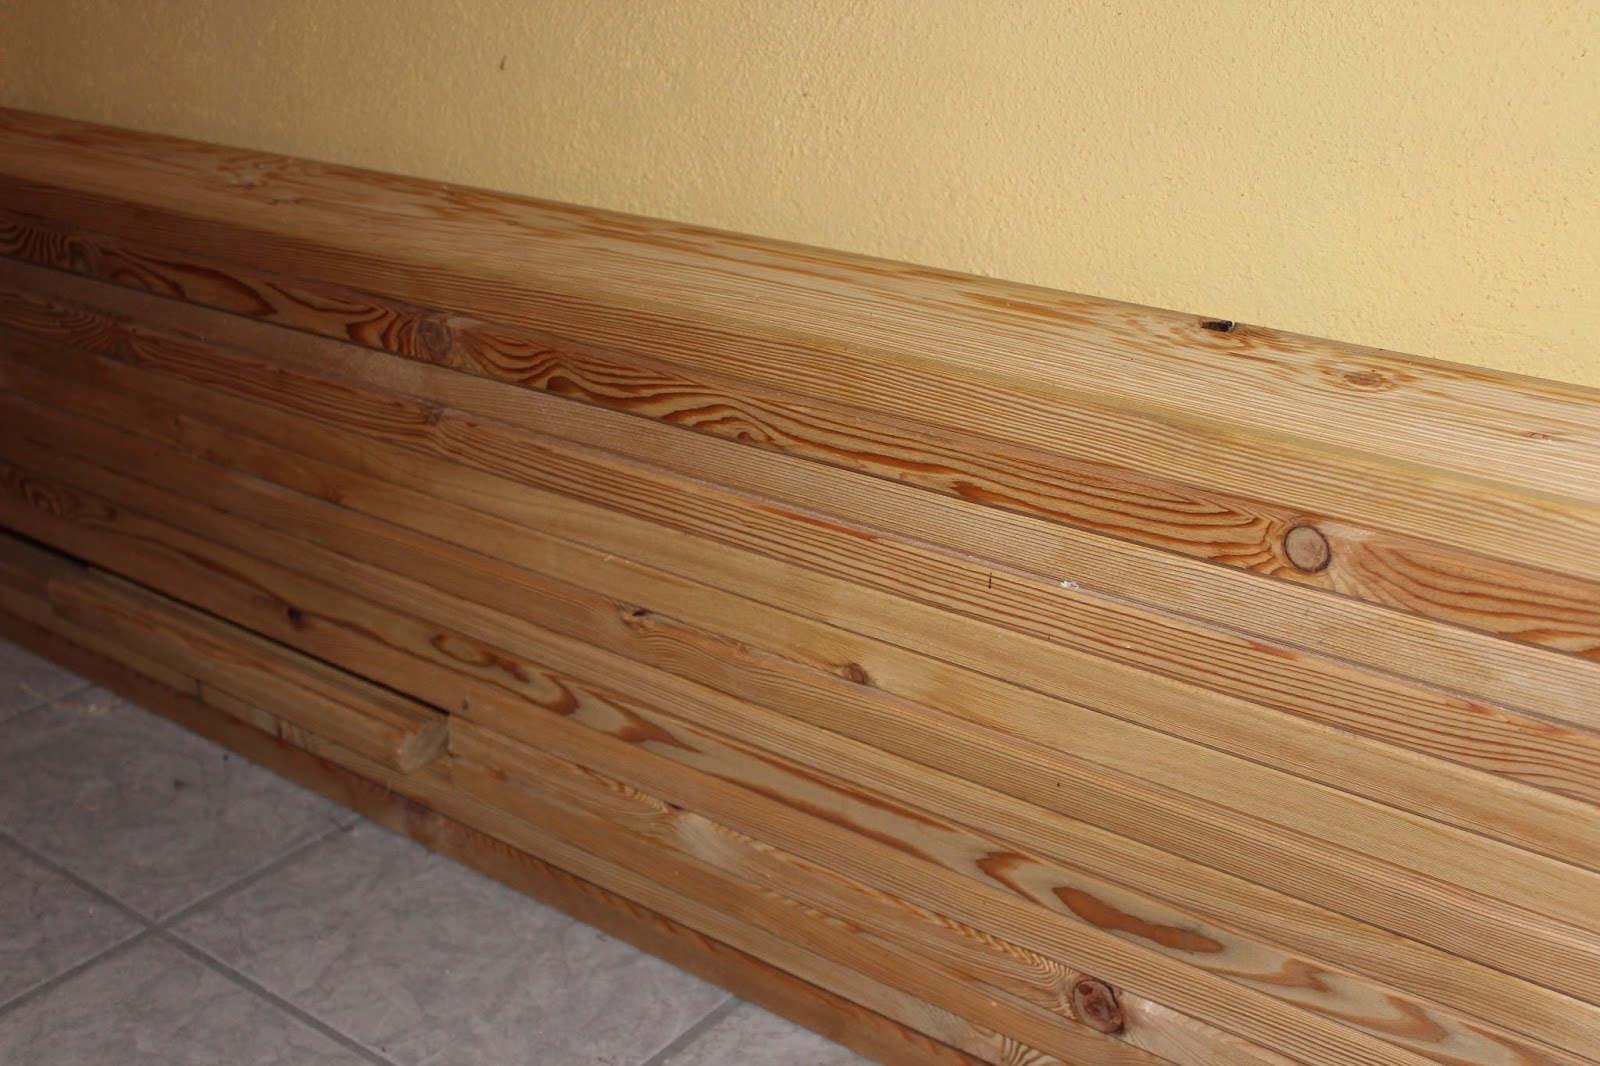 wildes gartengl ck garten terrassenm bel selber bauen. Black Bedroom Furniture Sets. Home Design Ideas